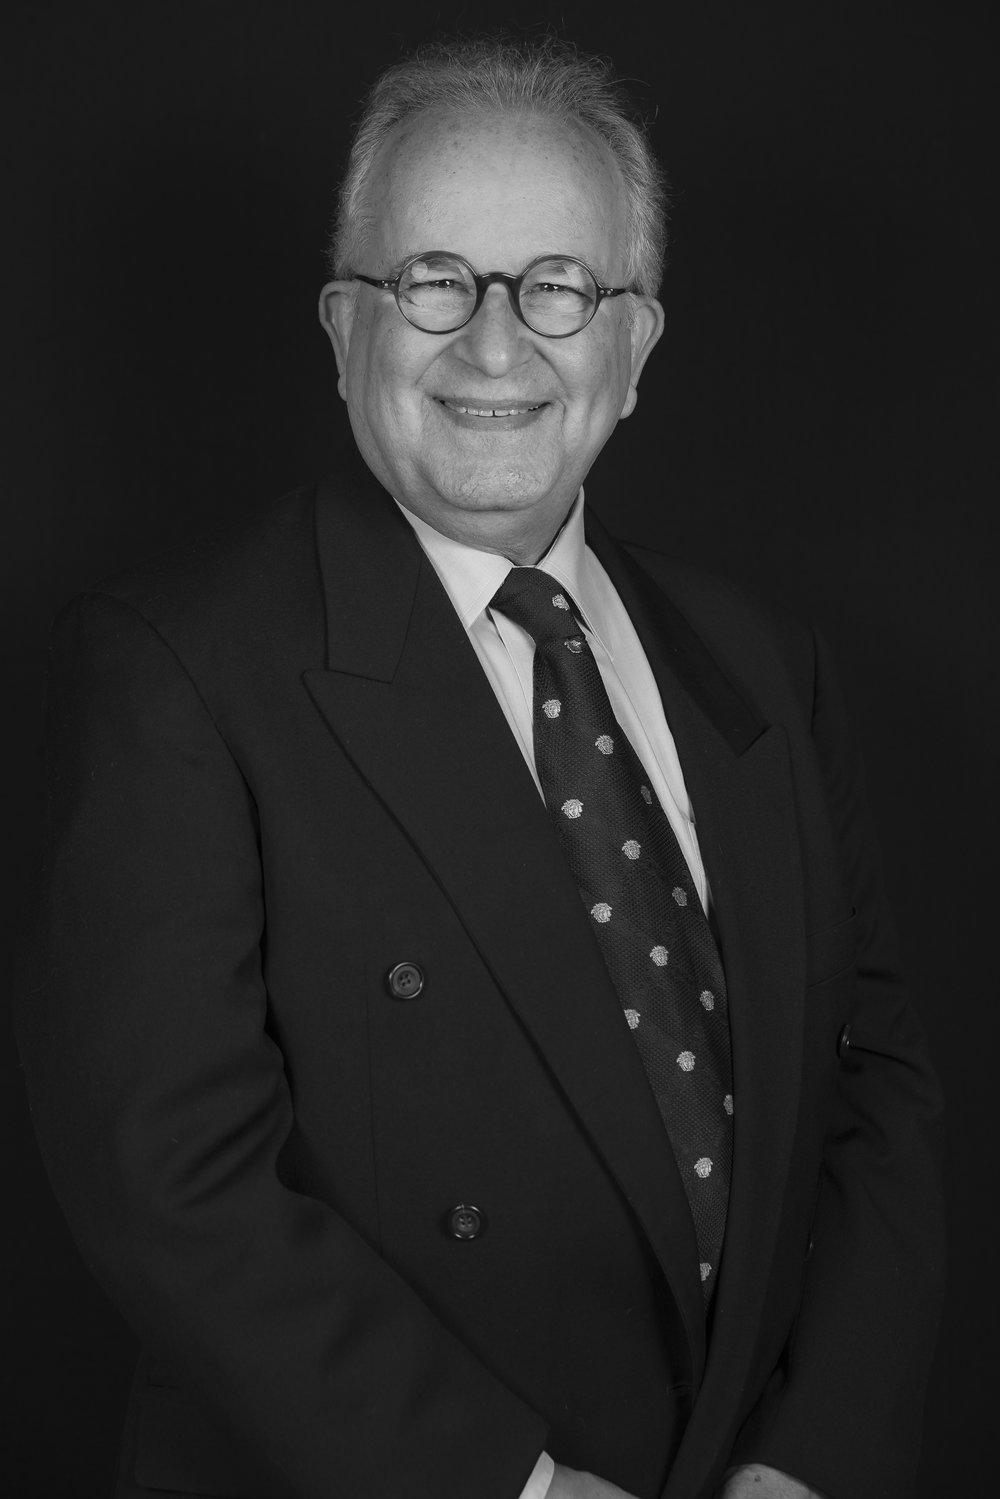 Raphaël Serfaty